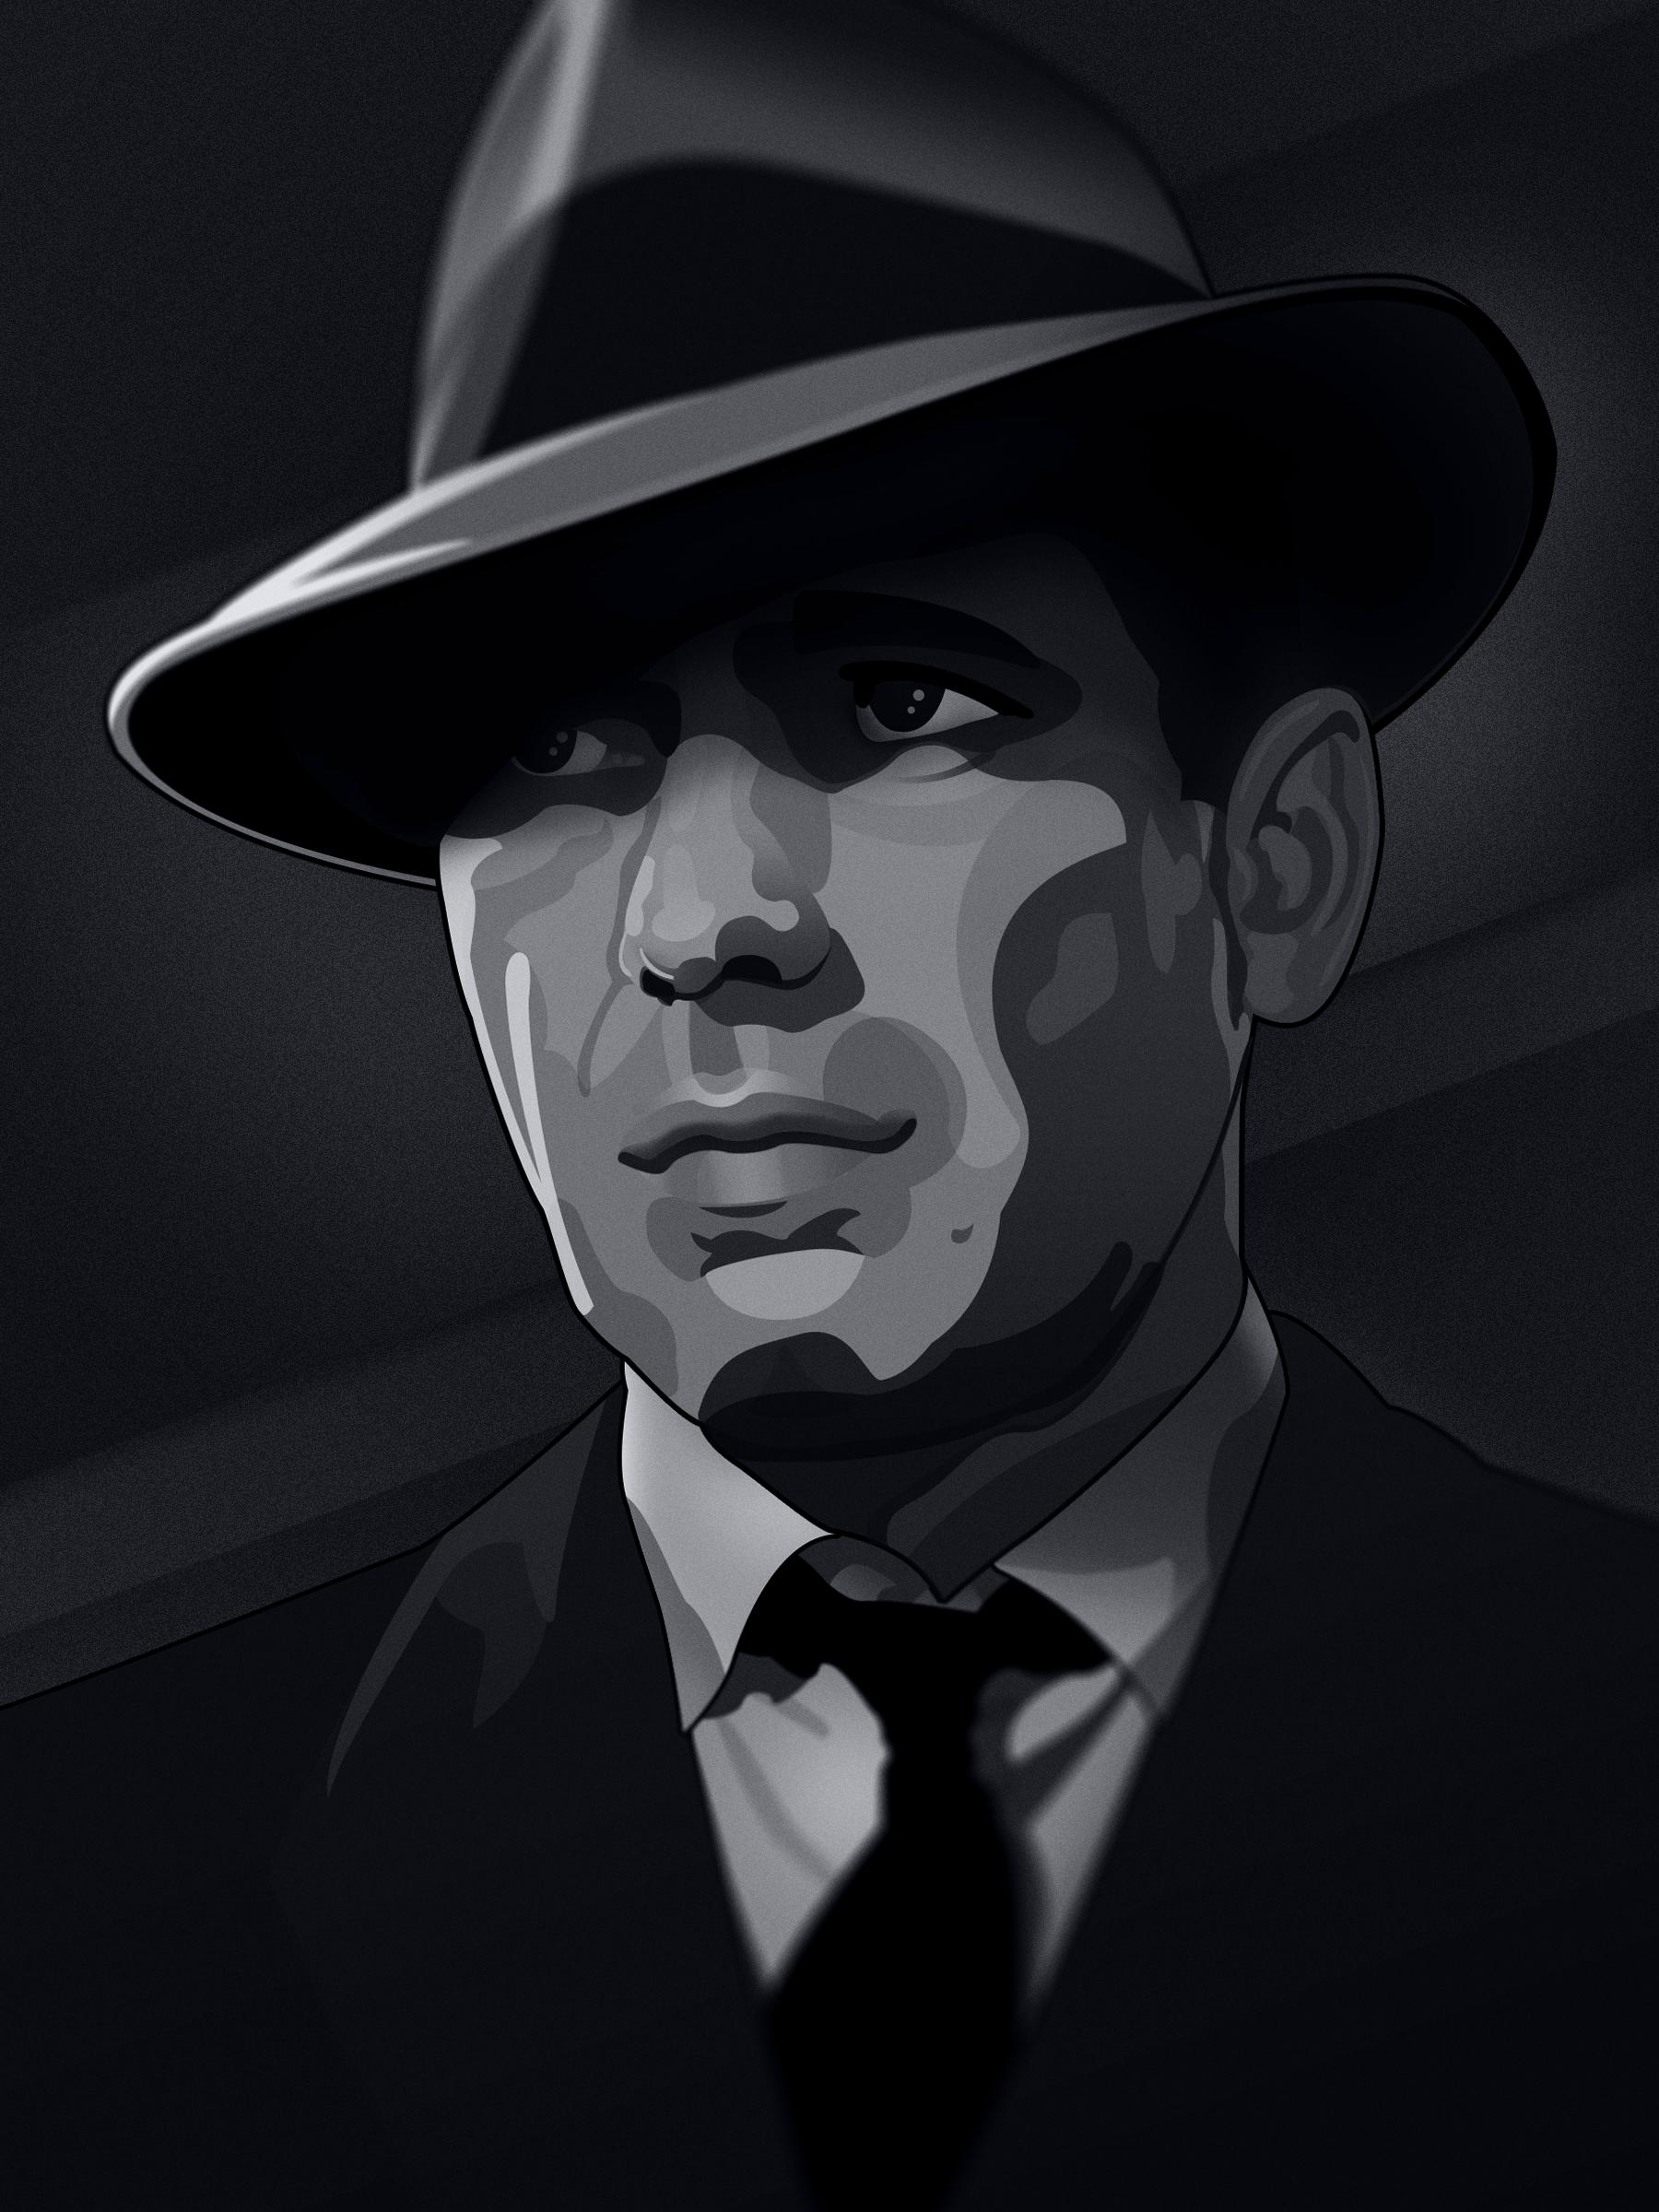 The Maltese Falcon: Sam Spade